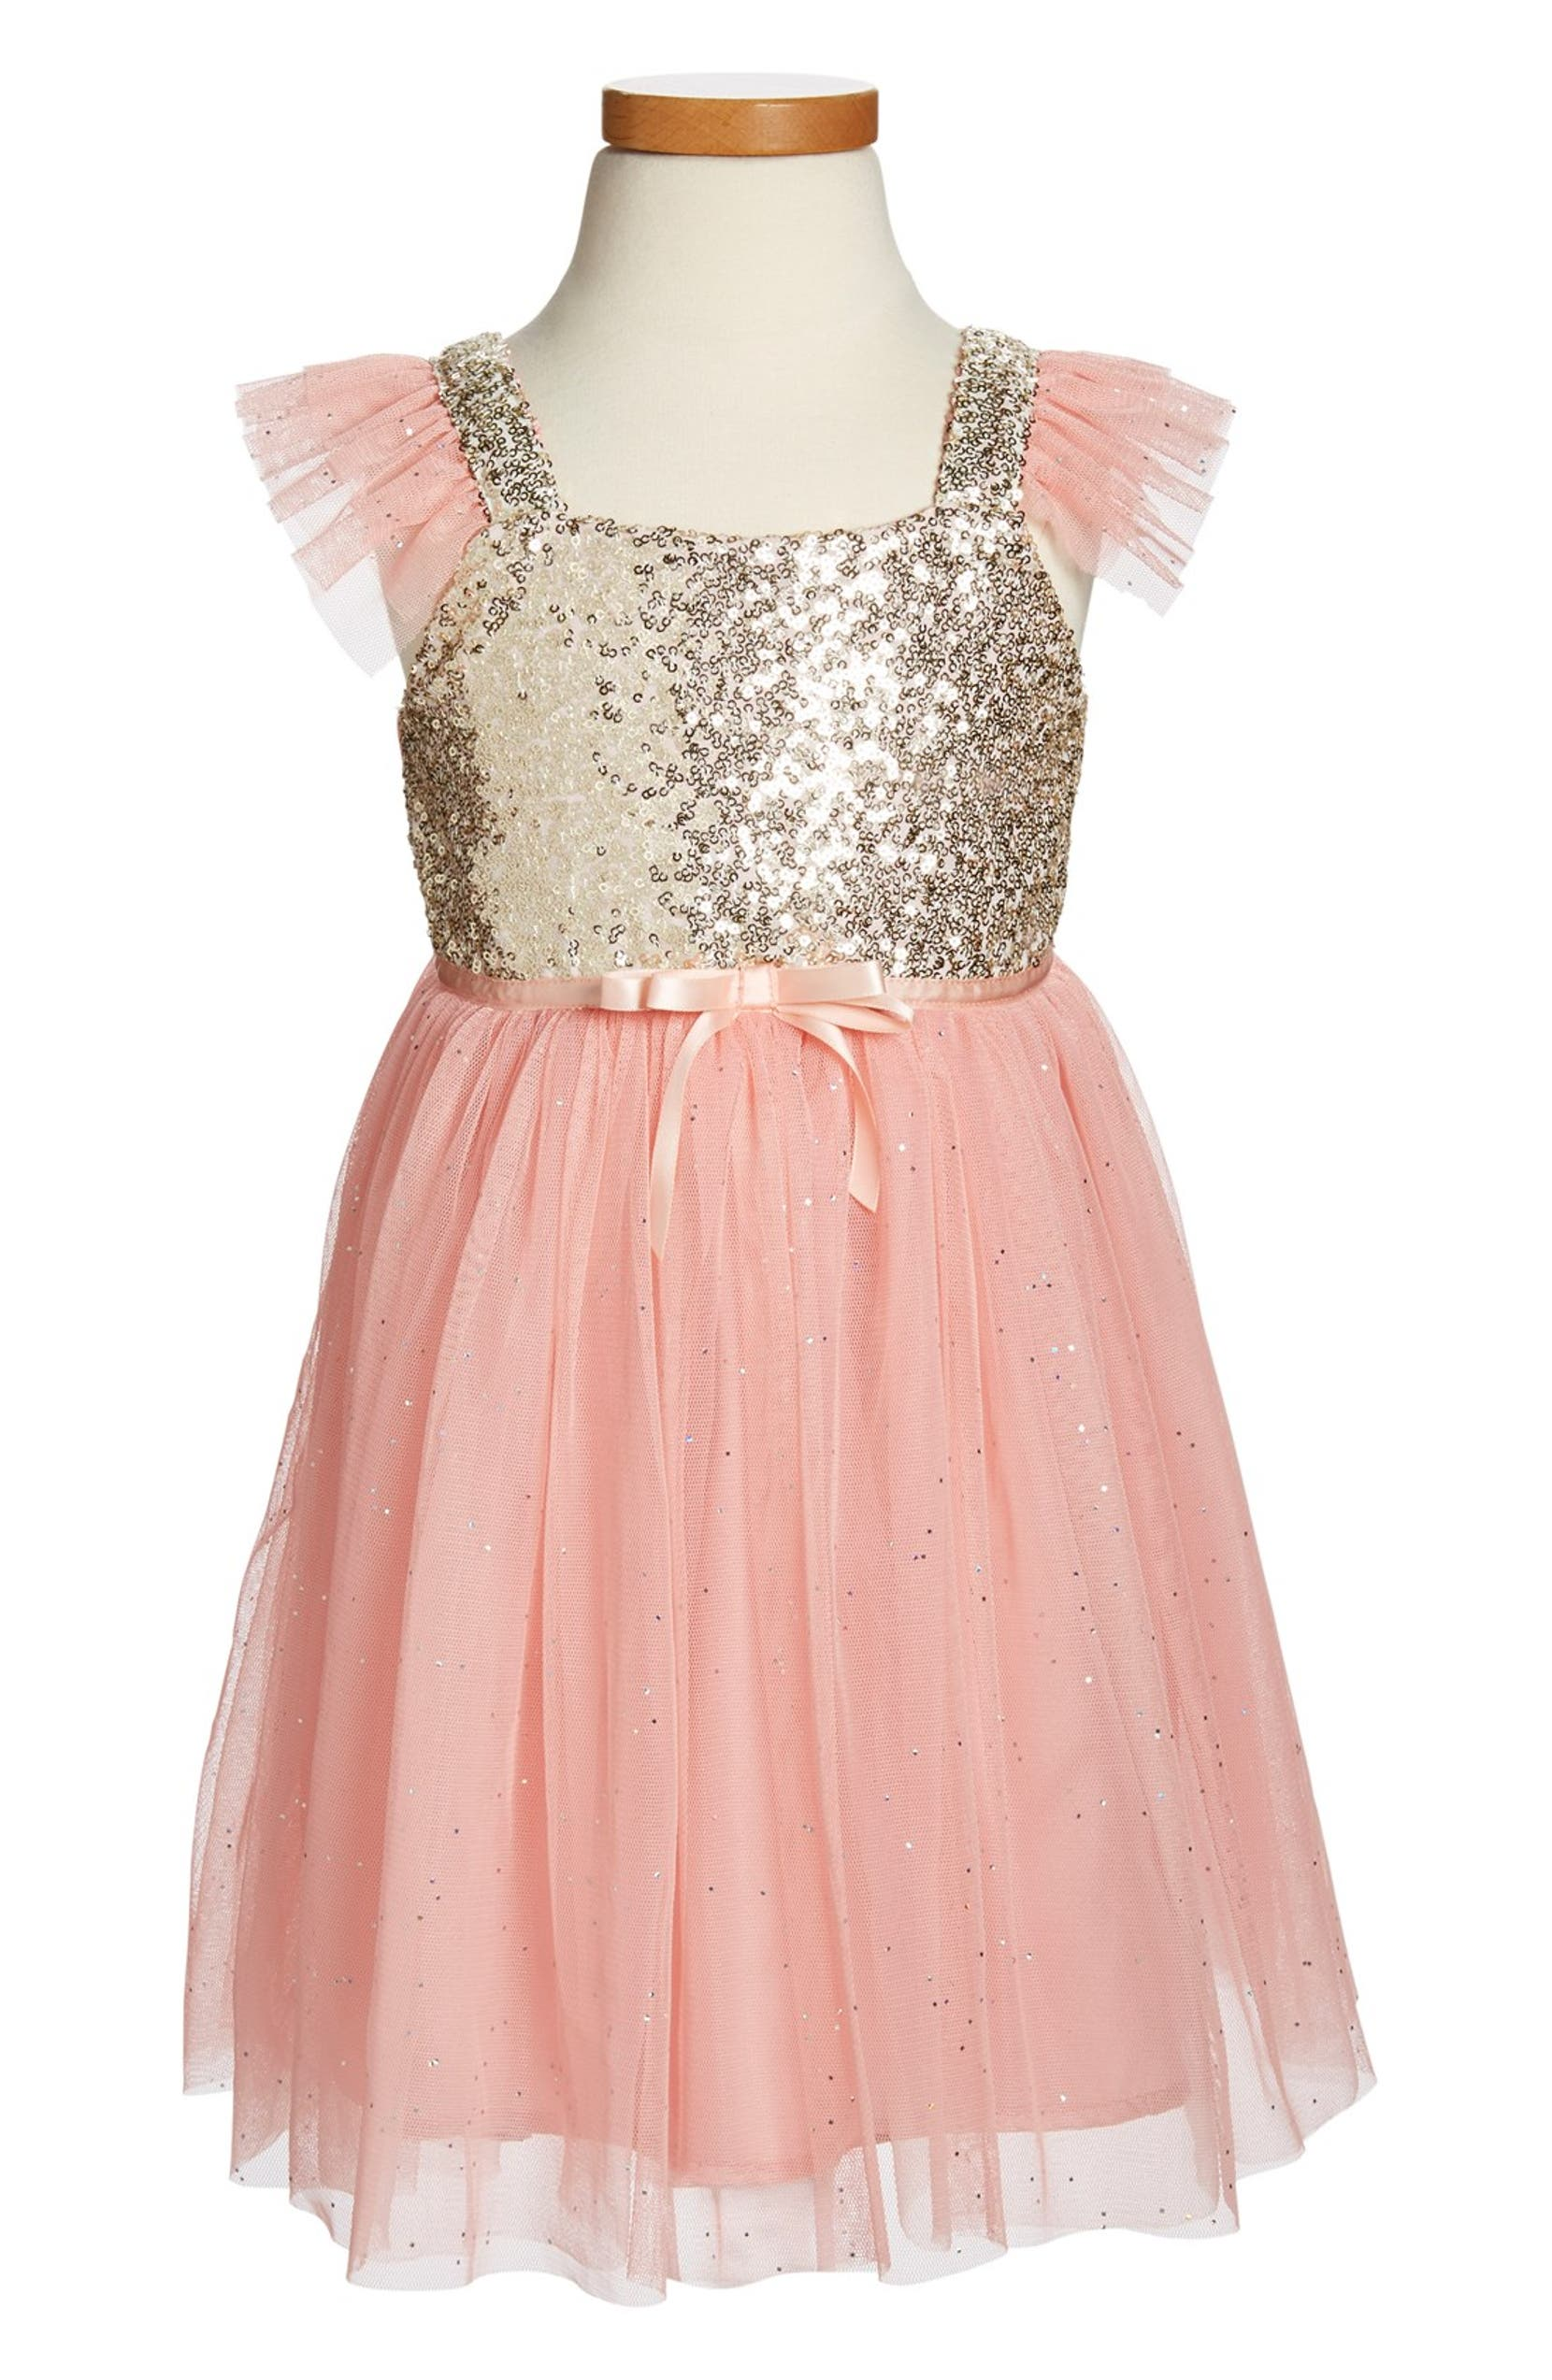 9c6a8a930a Sequin Bodice Tulle Dress